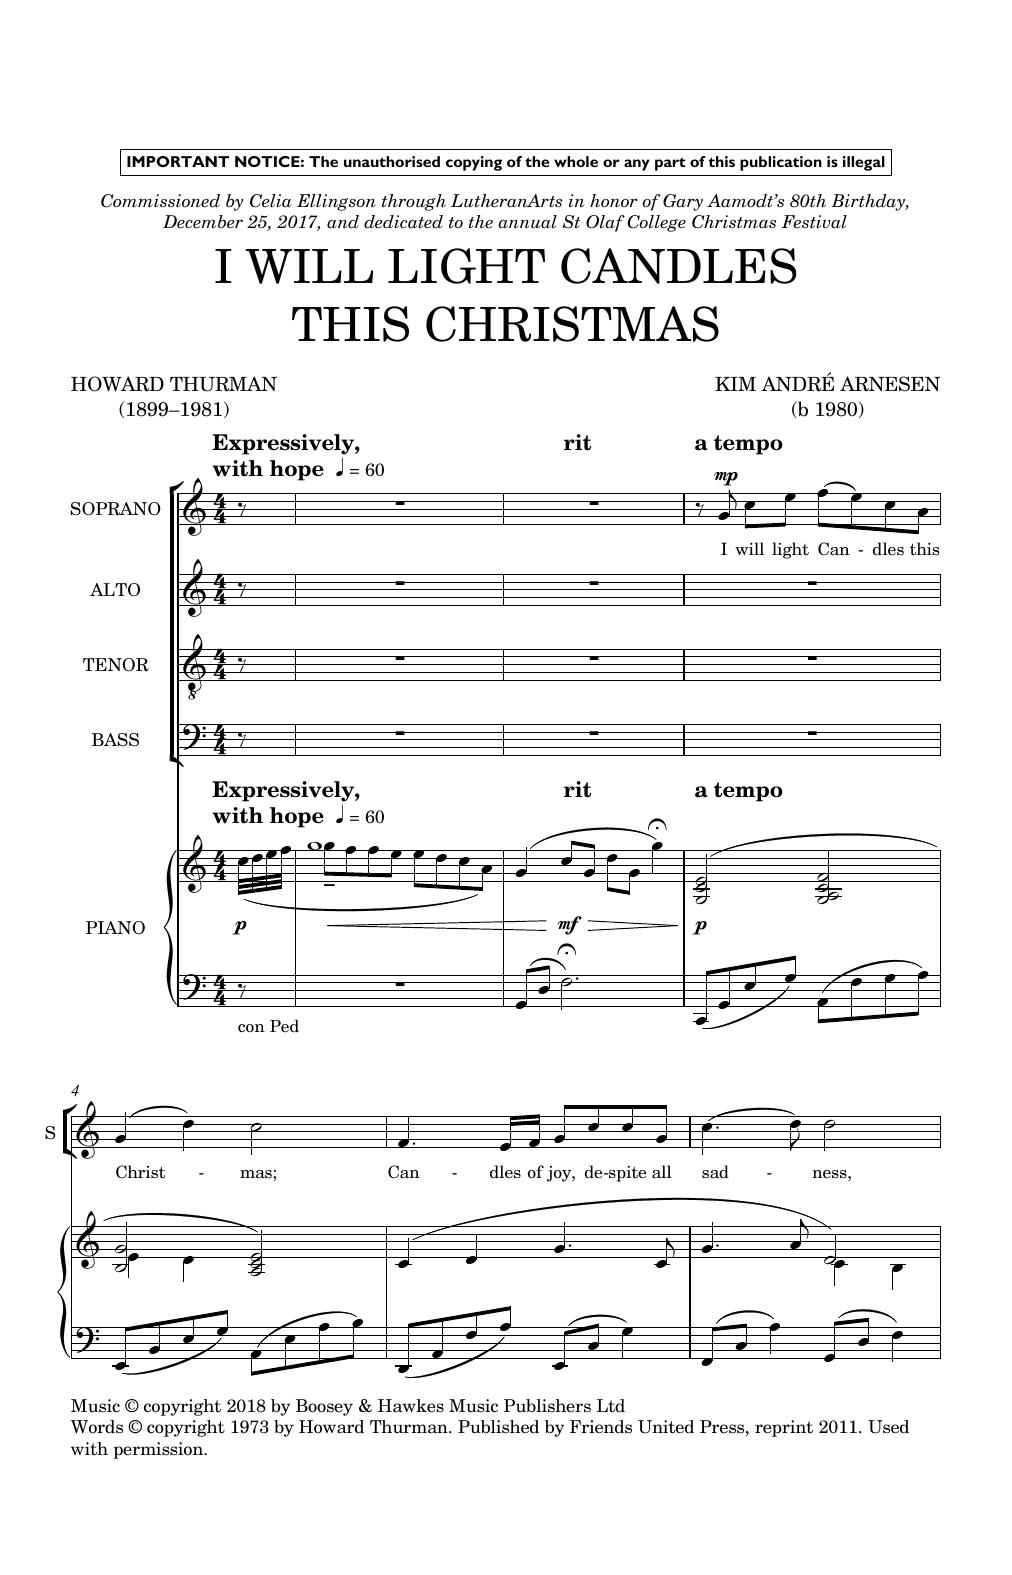 I Will Light Candles This Christmas (SATB Choir)